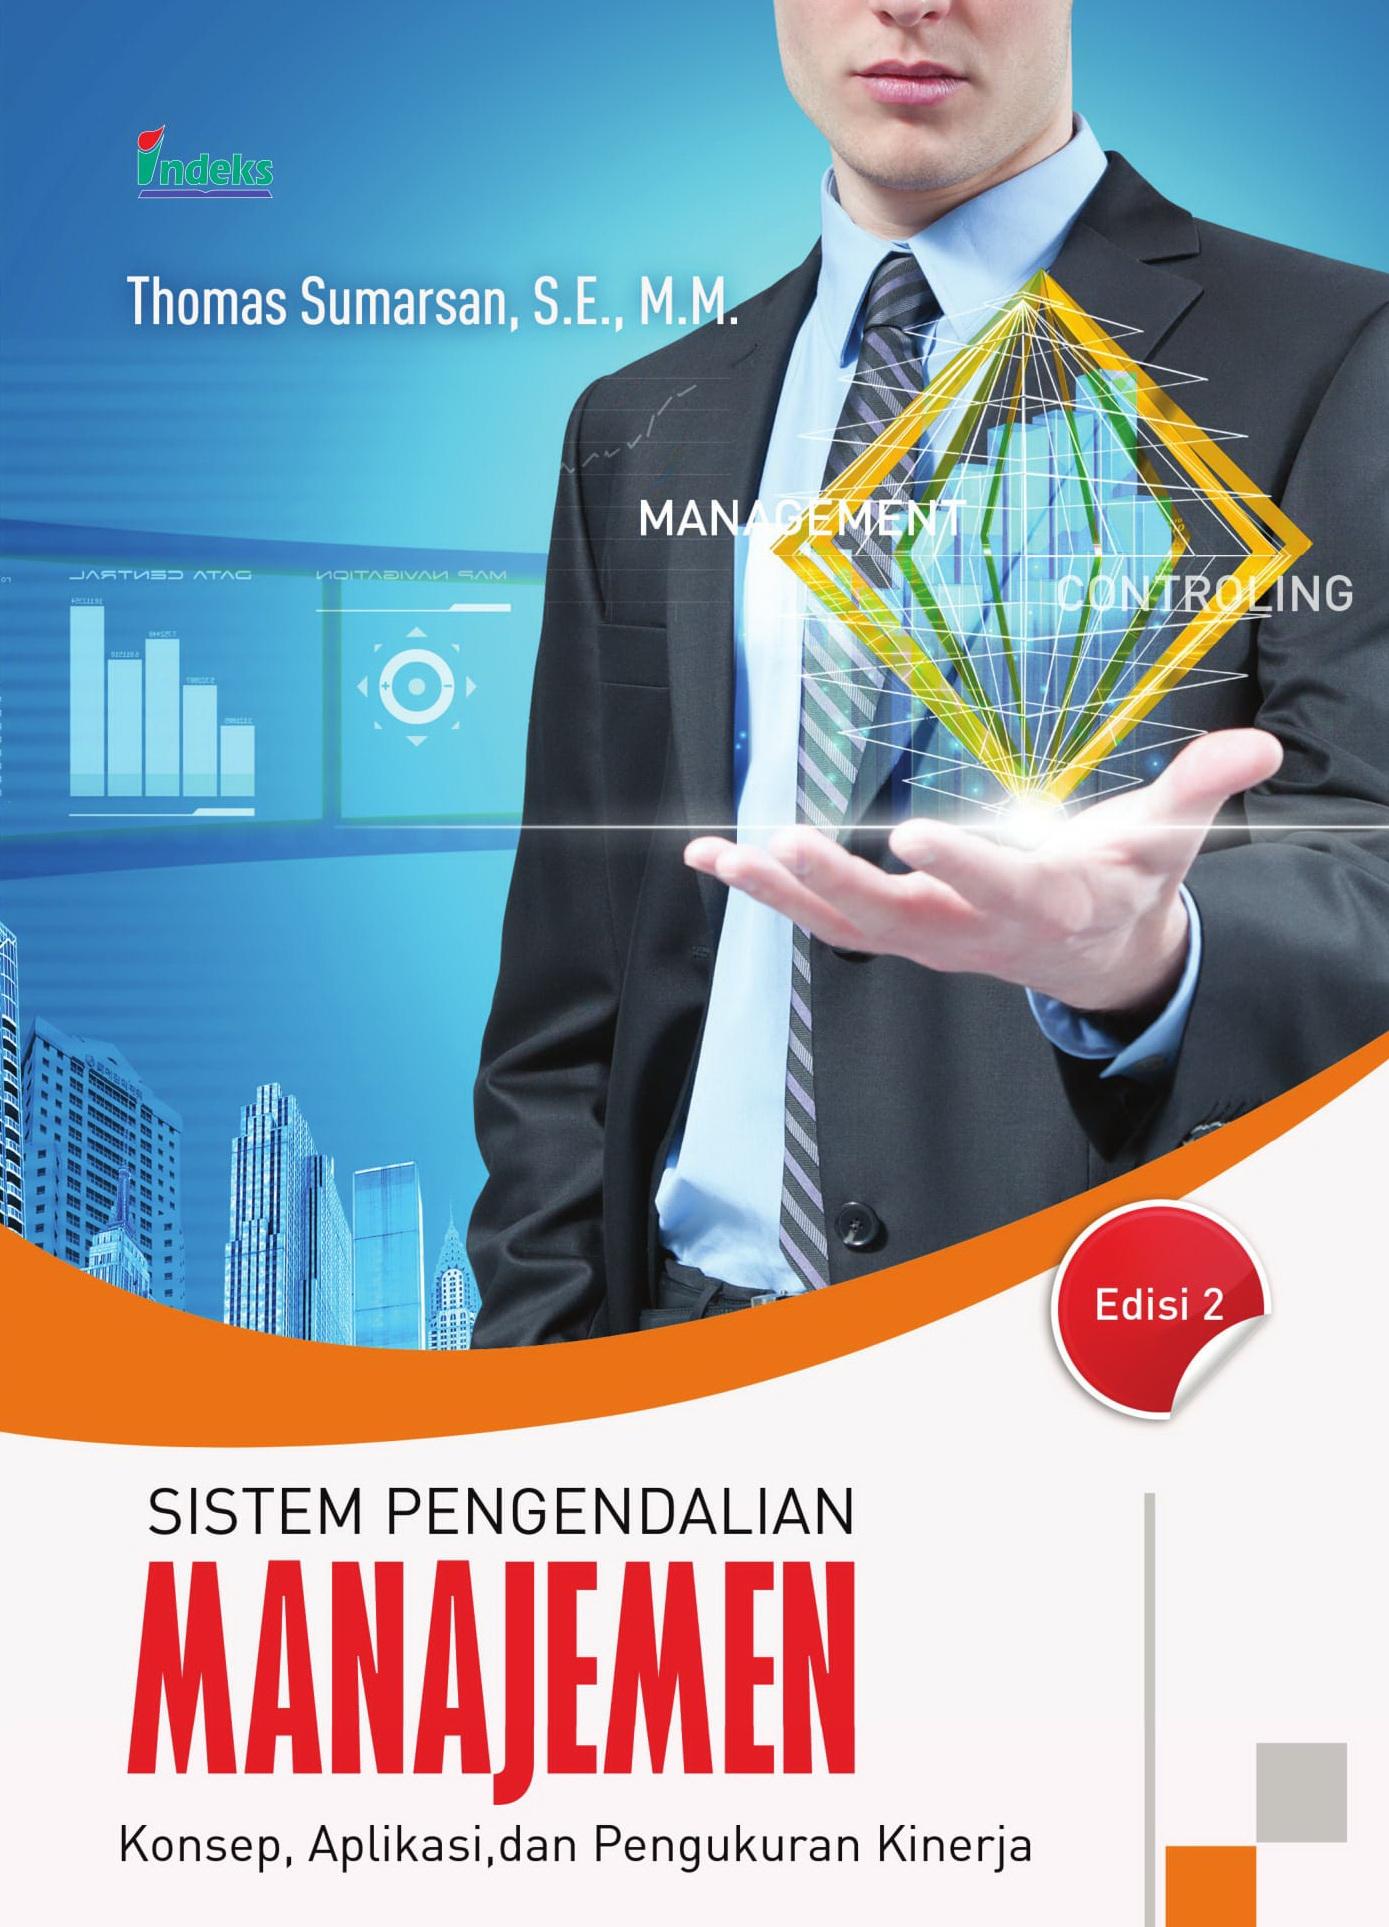 ... Indeks - Sistem Pengendalian Manajemen Edisi 2 - Thomas Sumarsan ...